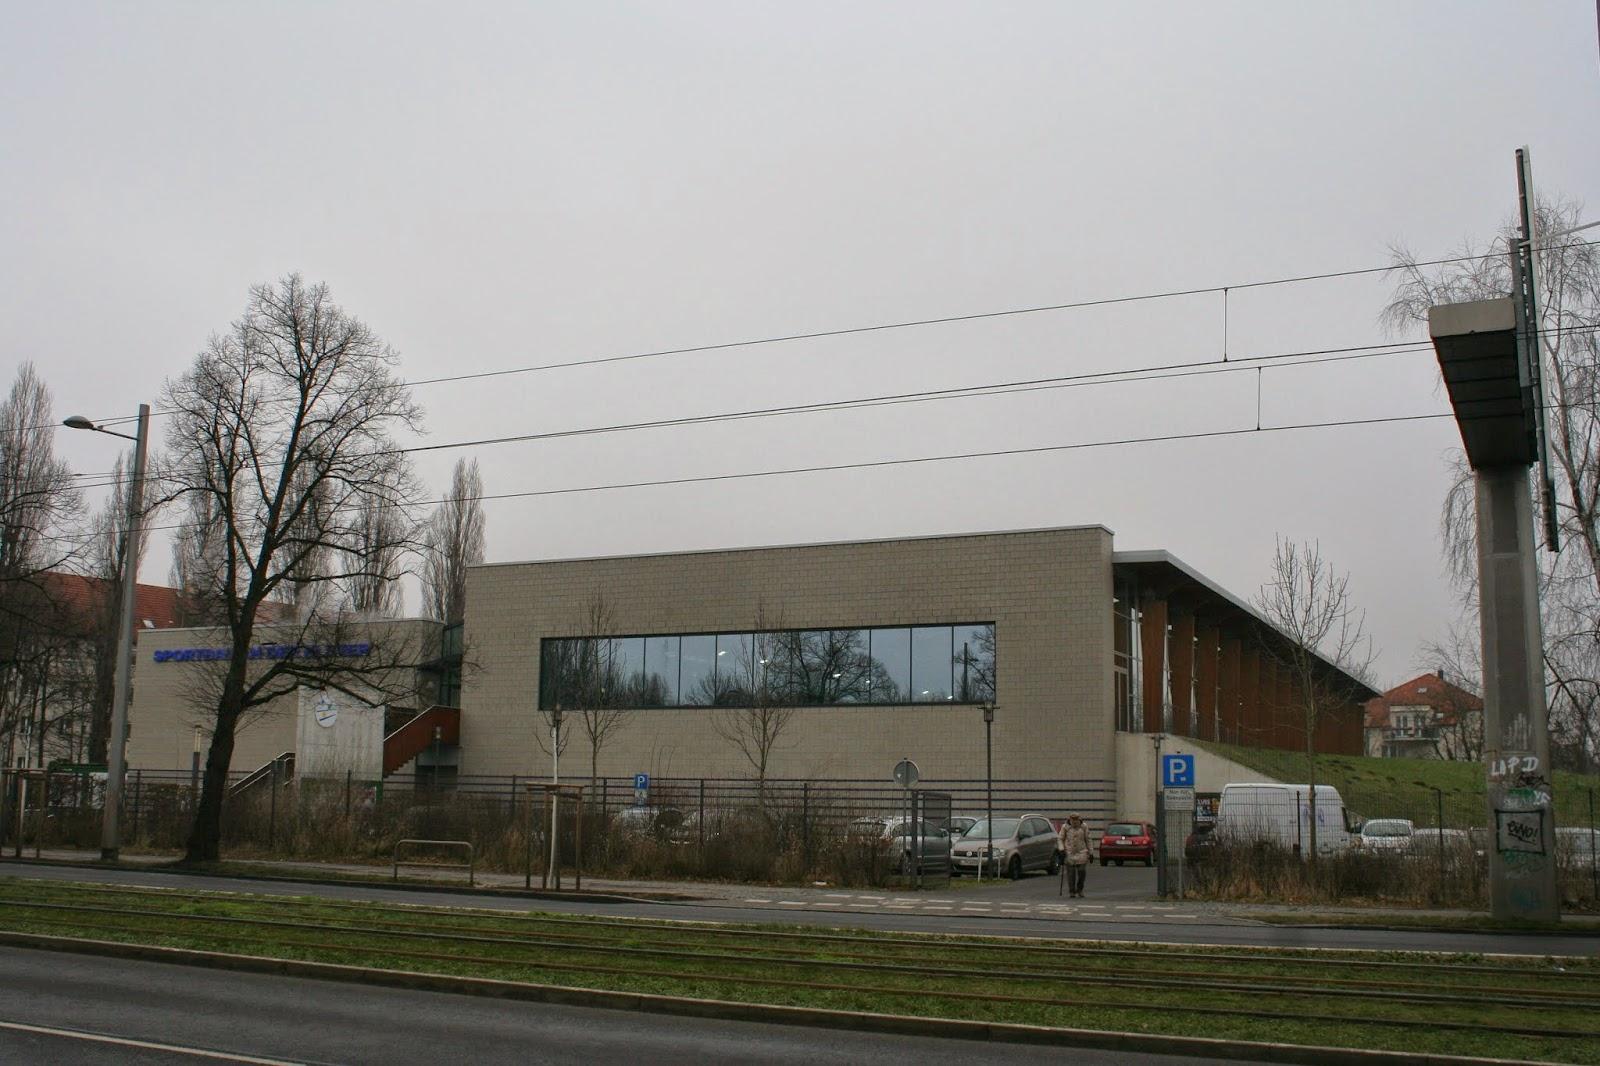 Sportbad an der Elster - Leipzig-Days